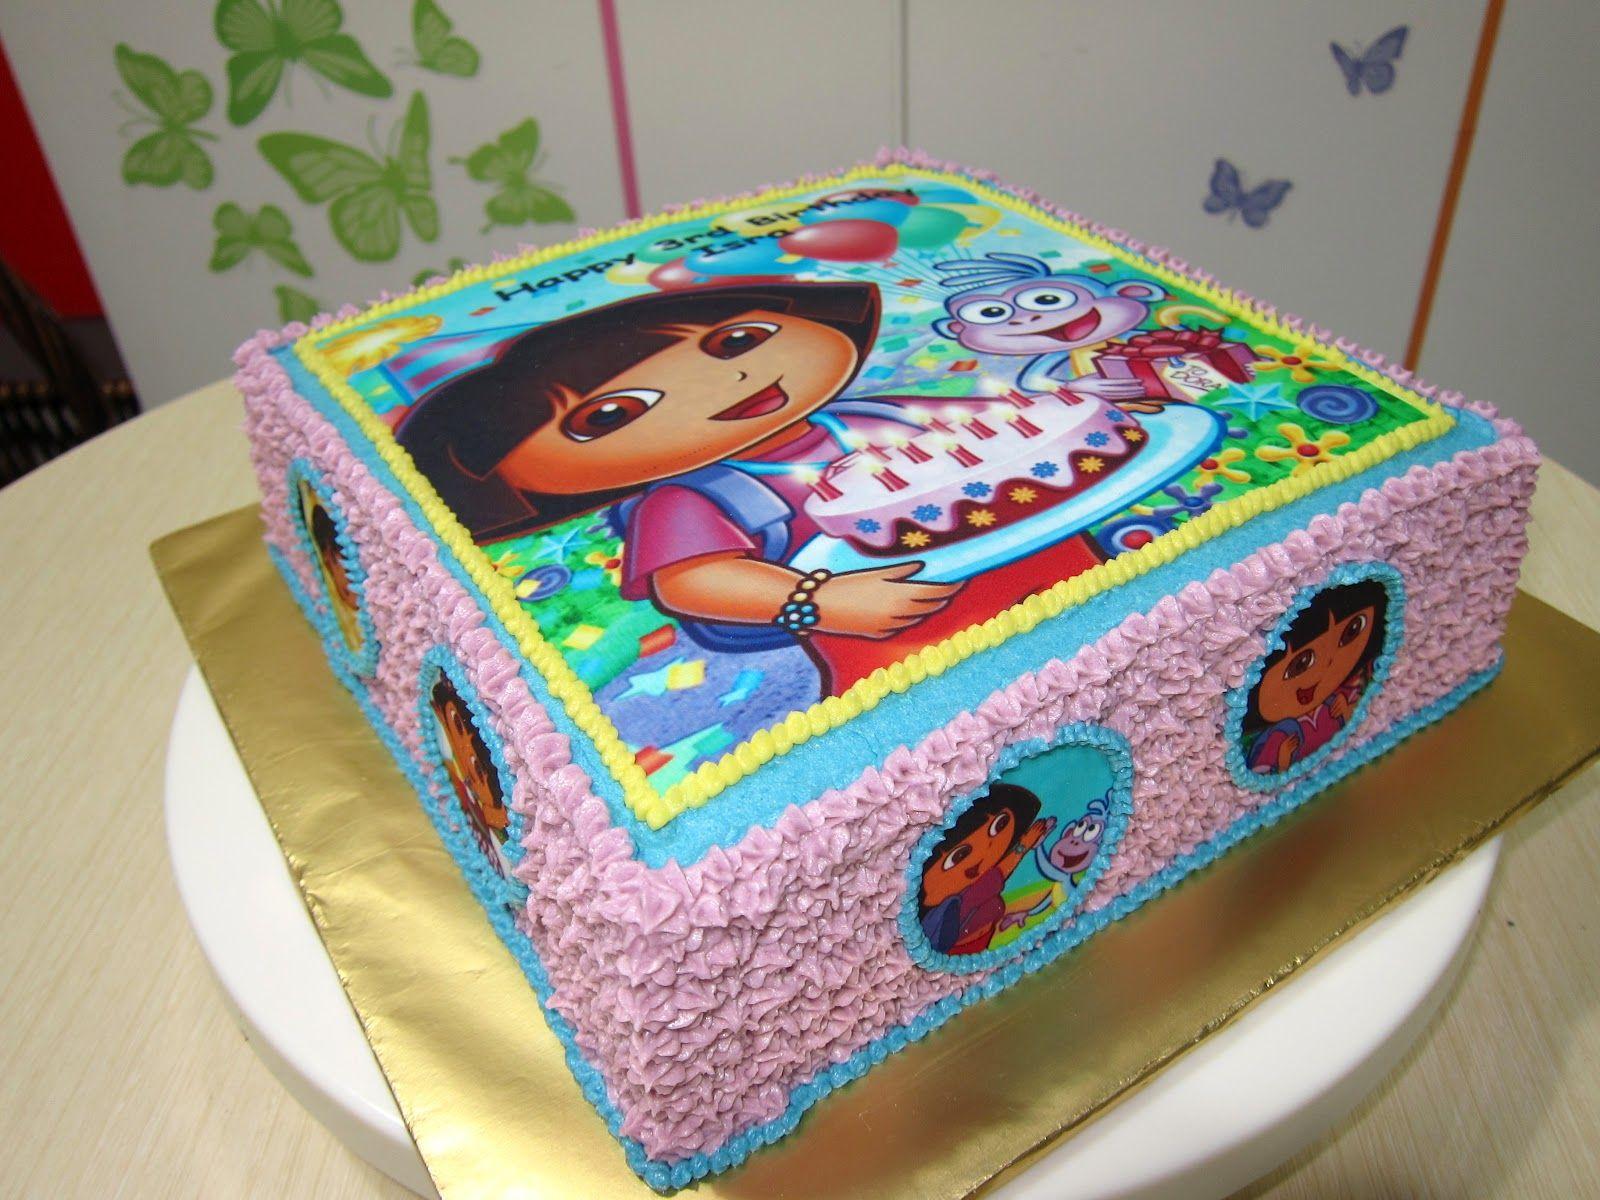 Cake Design Dora L Exploratrice : dora cake - Recherche Google gateaux anniversaires ...